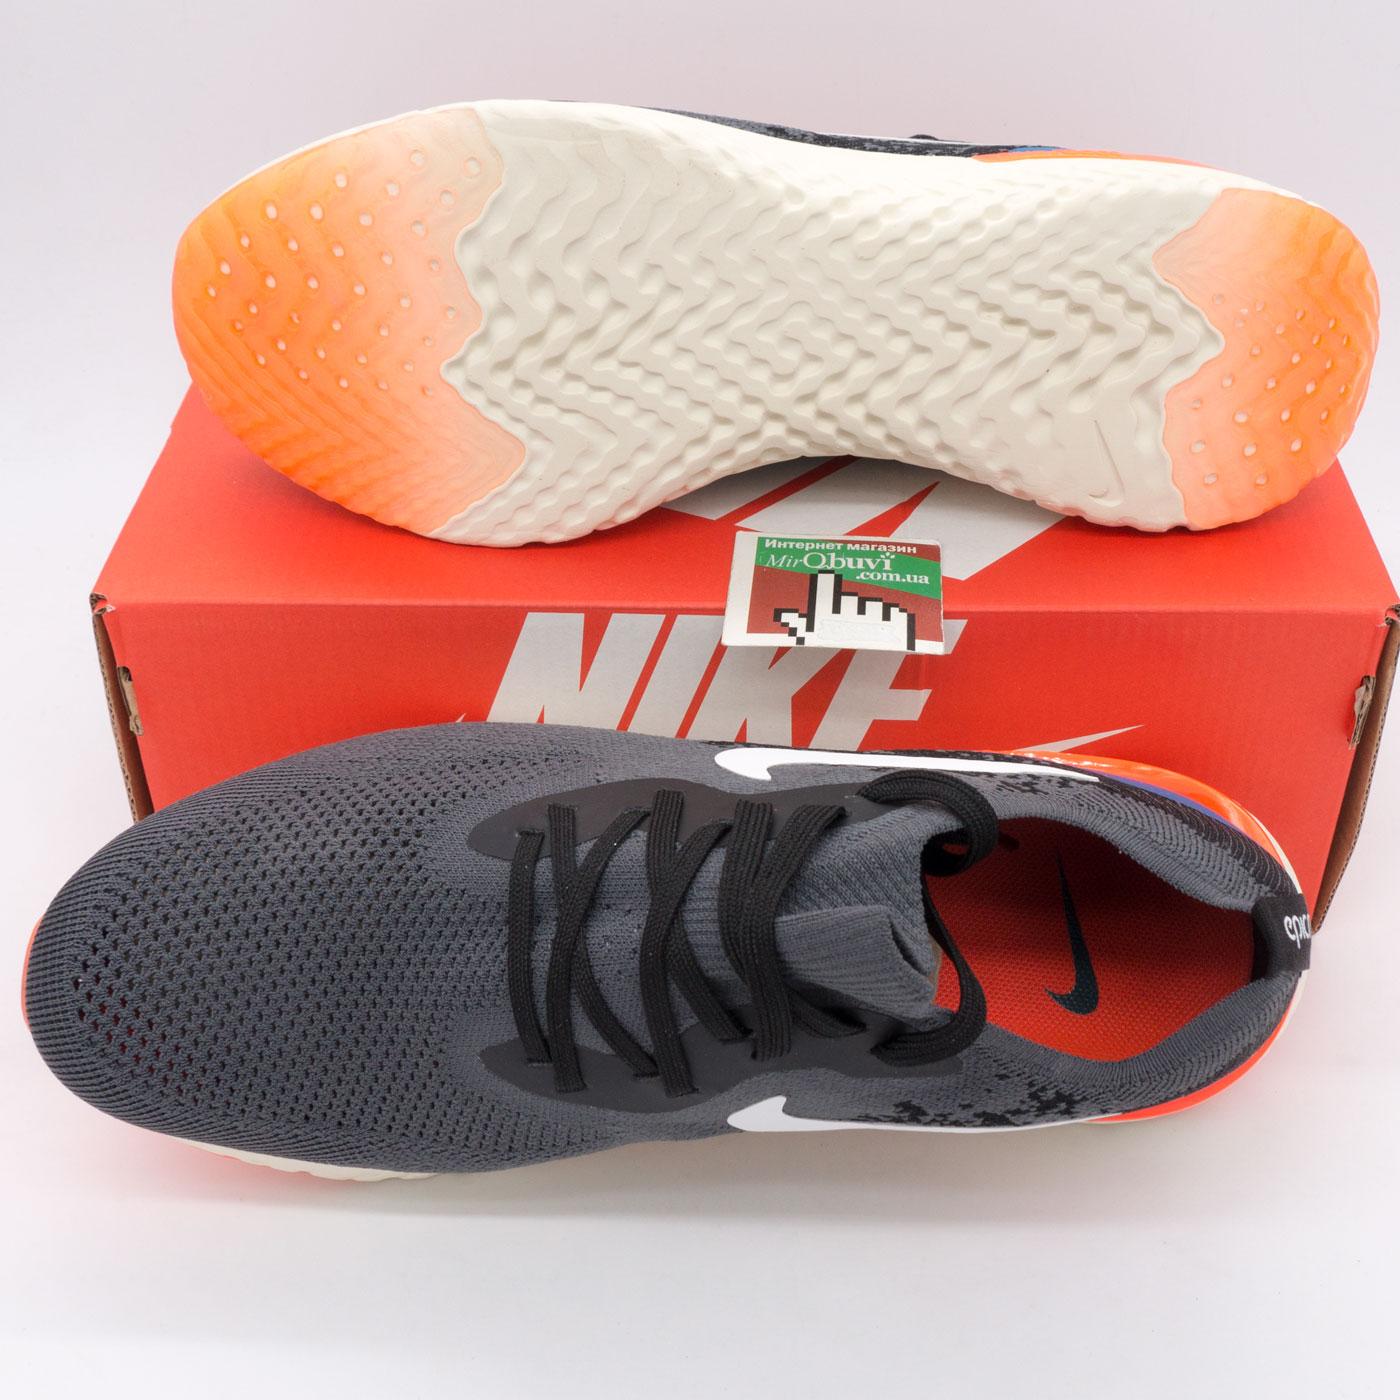 фото bottom Мужские кроссовки для бега Nike Epic React Flyknit пепел. Топ качество! bottom